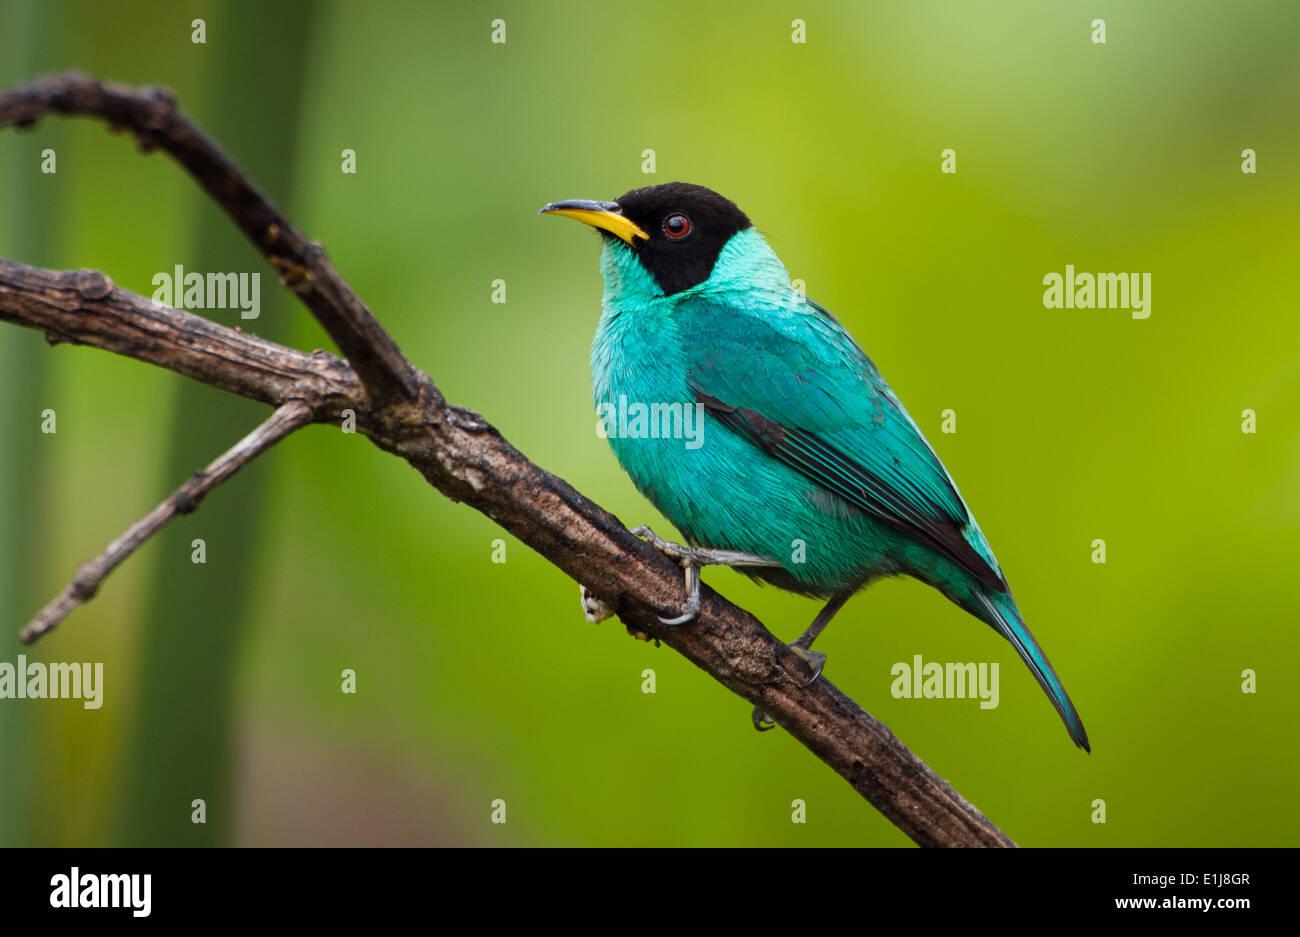 Atlantic rainforest stockfotos atlantic rainforest bilder alamy - Epiphyten zimmerpflanze ...